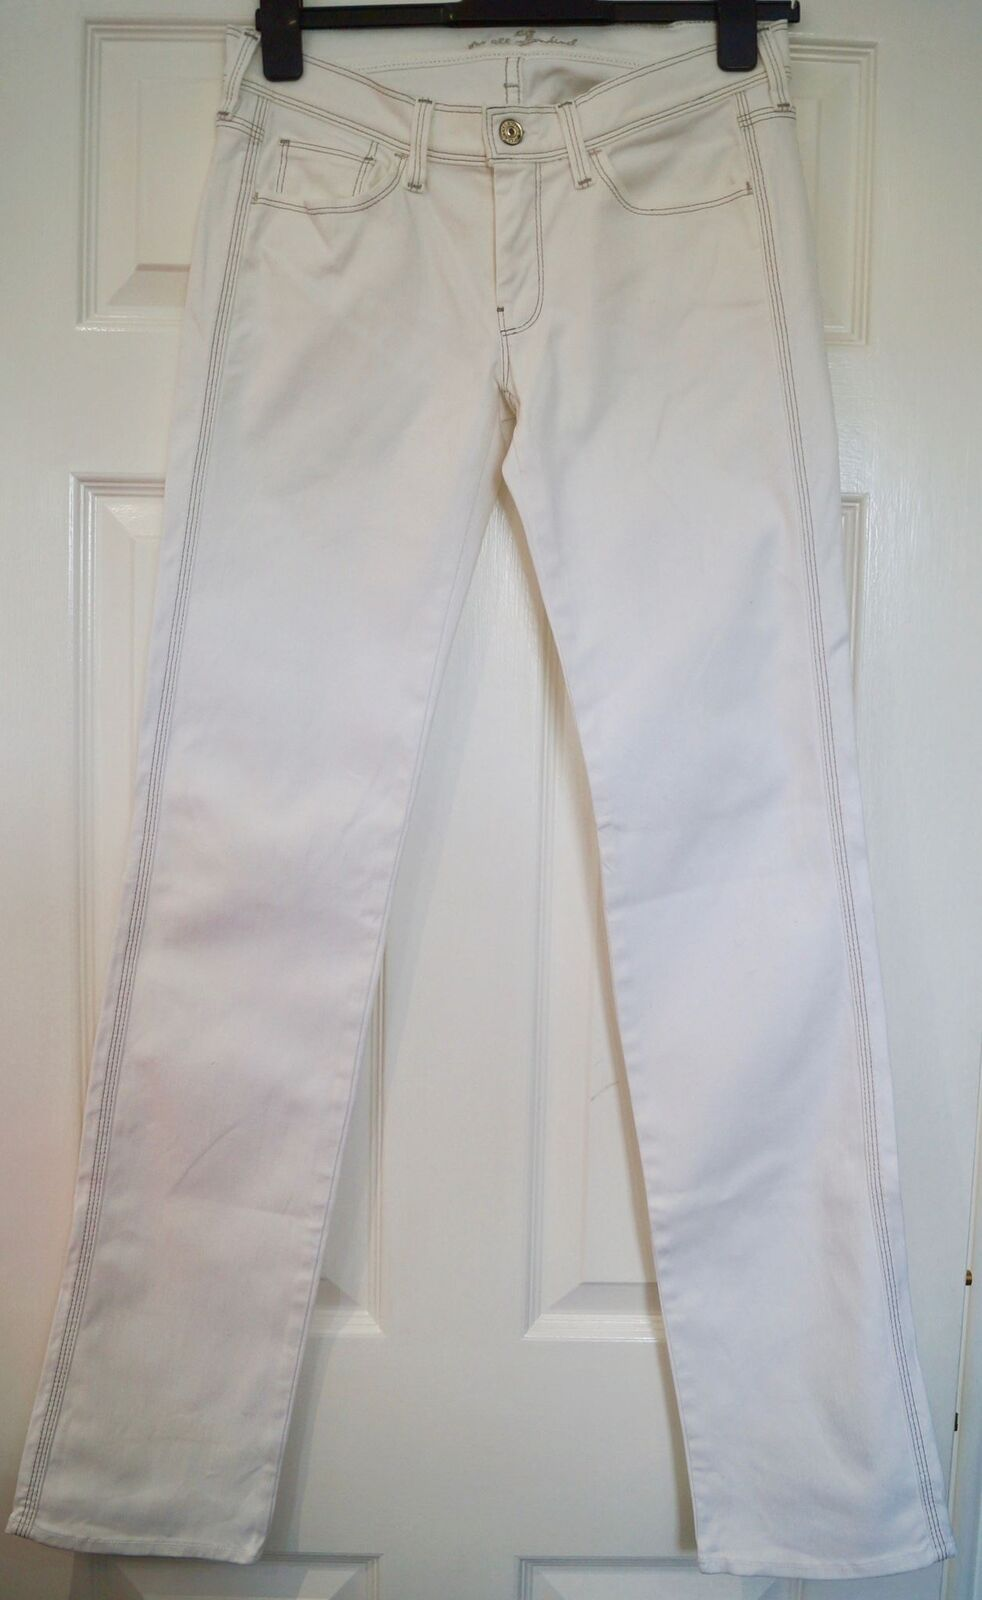 7 FOR ALL MANKIND Women's White STRAIGHT LEG Cotton Blend Denim Jeans 27